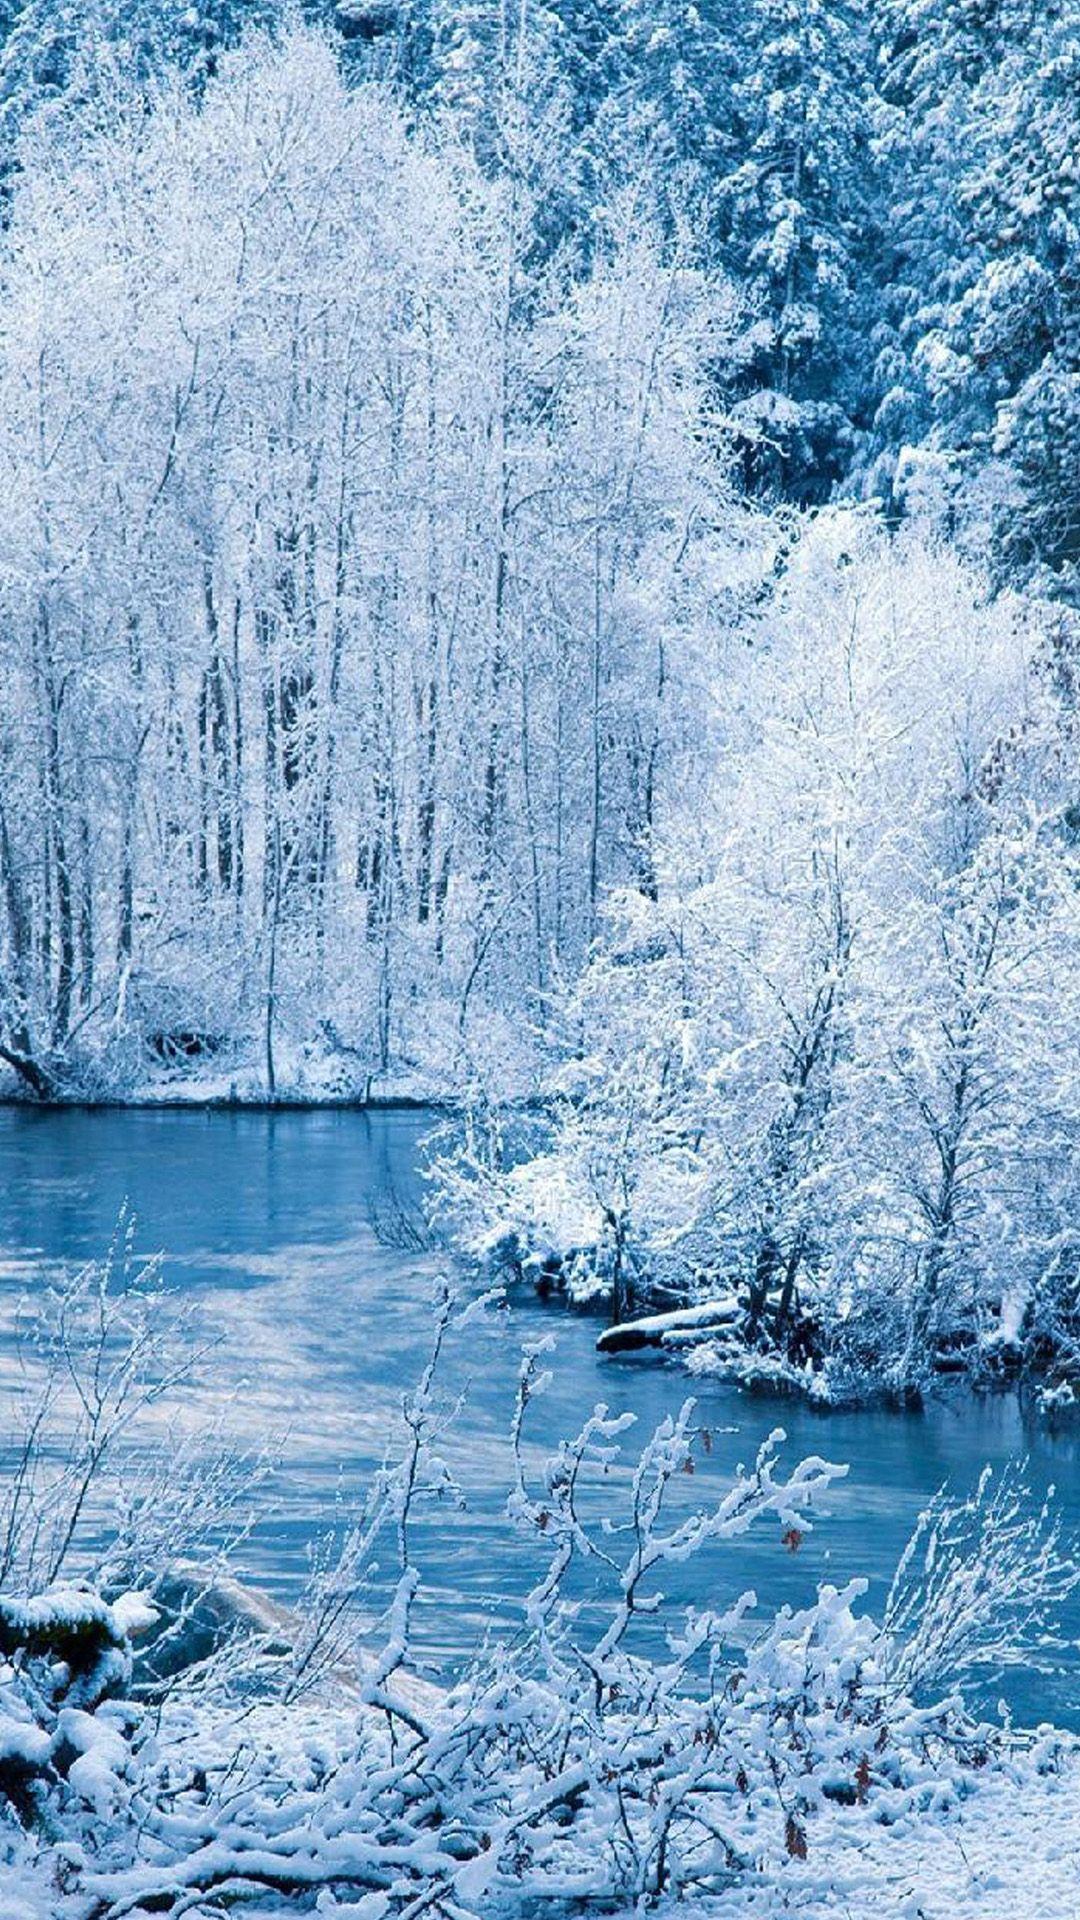 Samsung Galaxy S5 Wallpapers Winter Wallpaper Winter Scenery Winter Landscape